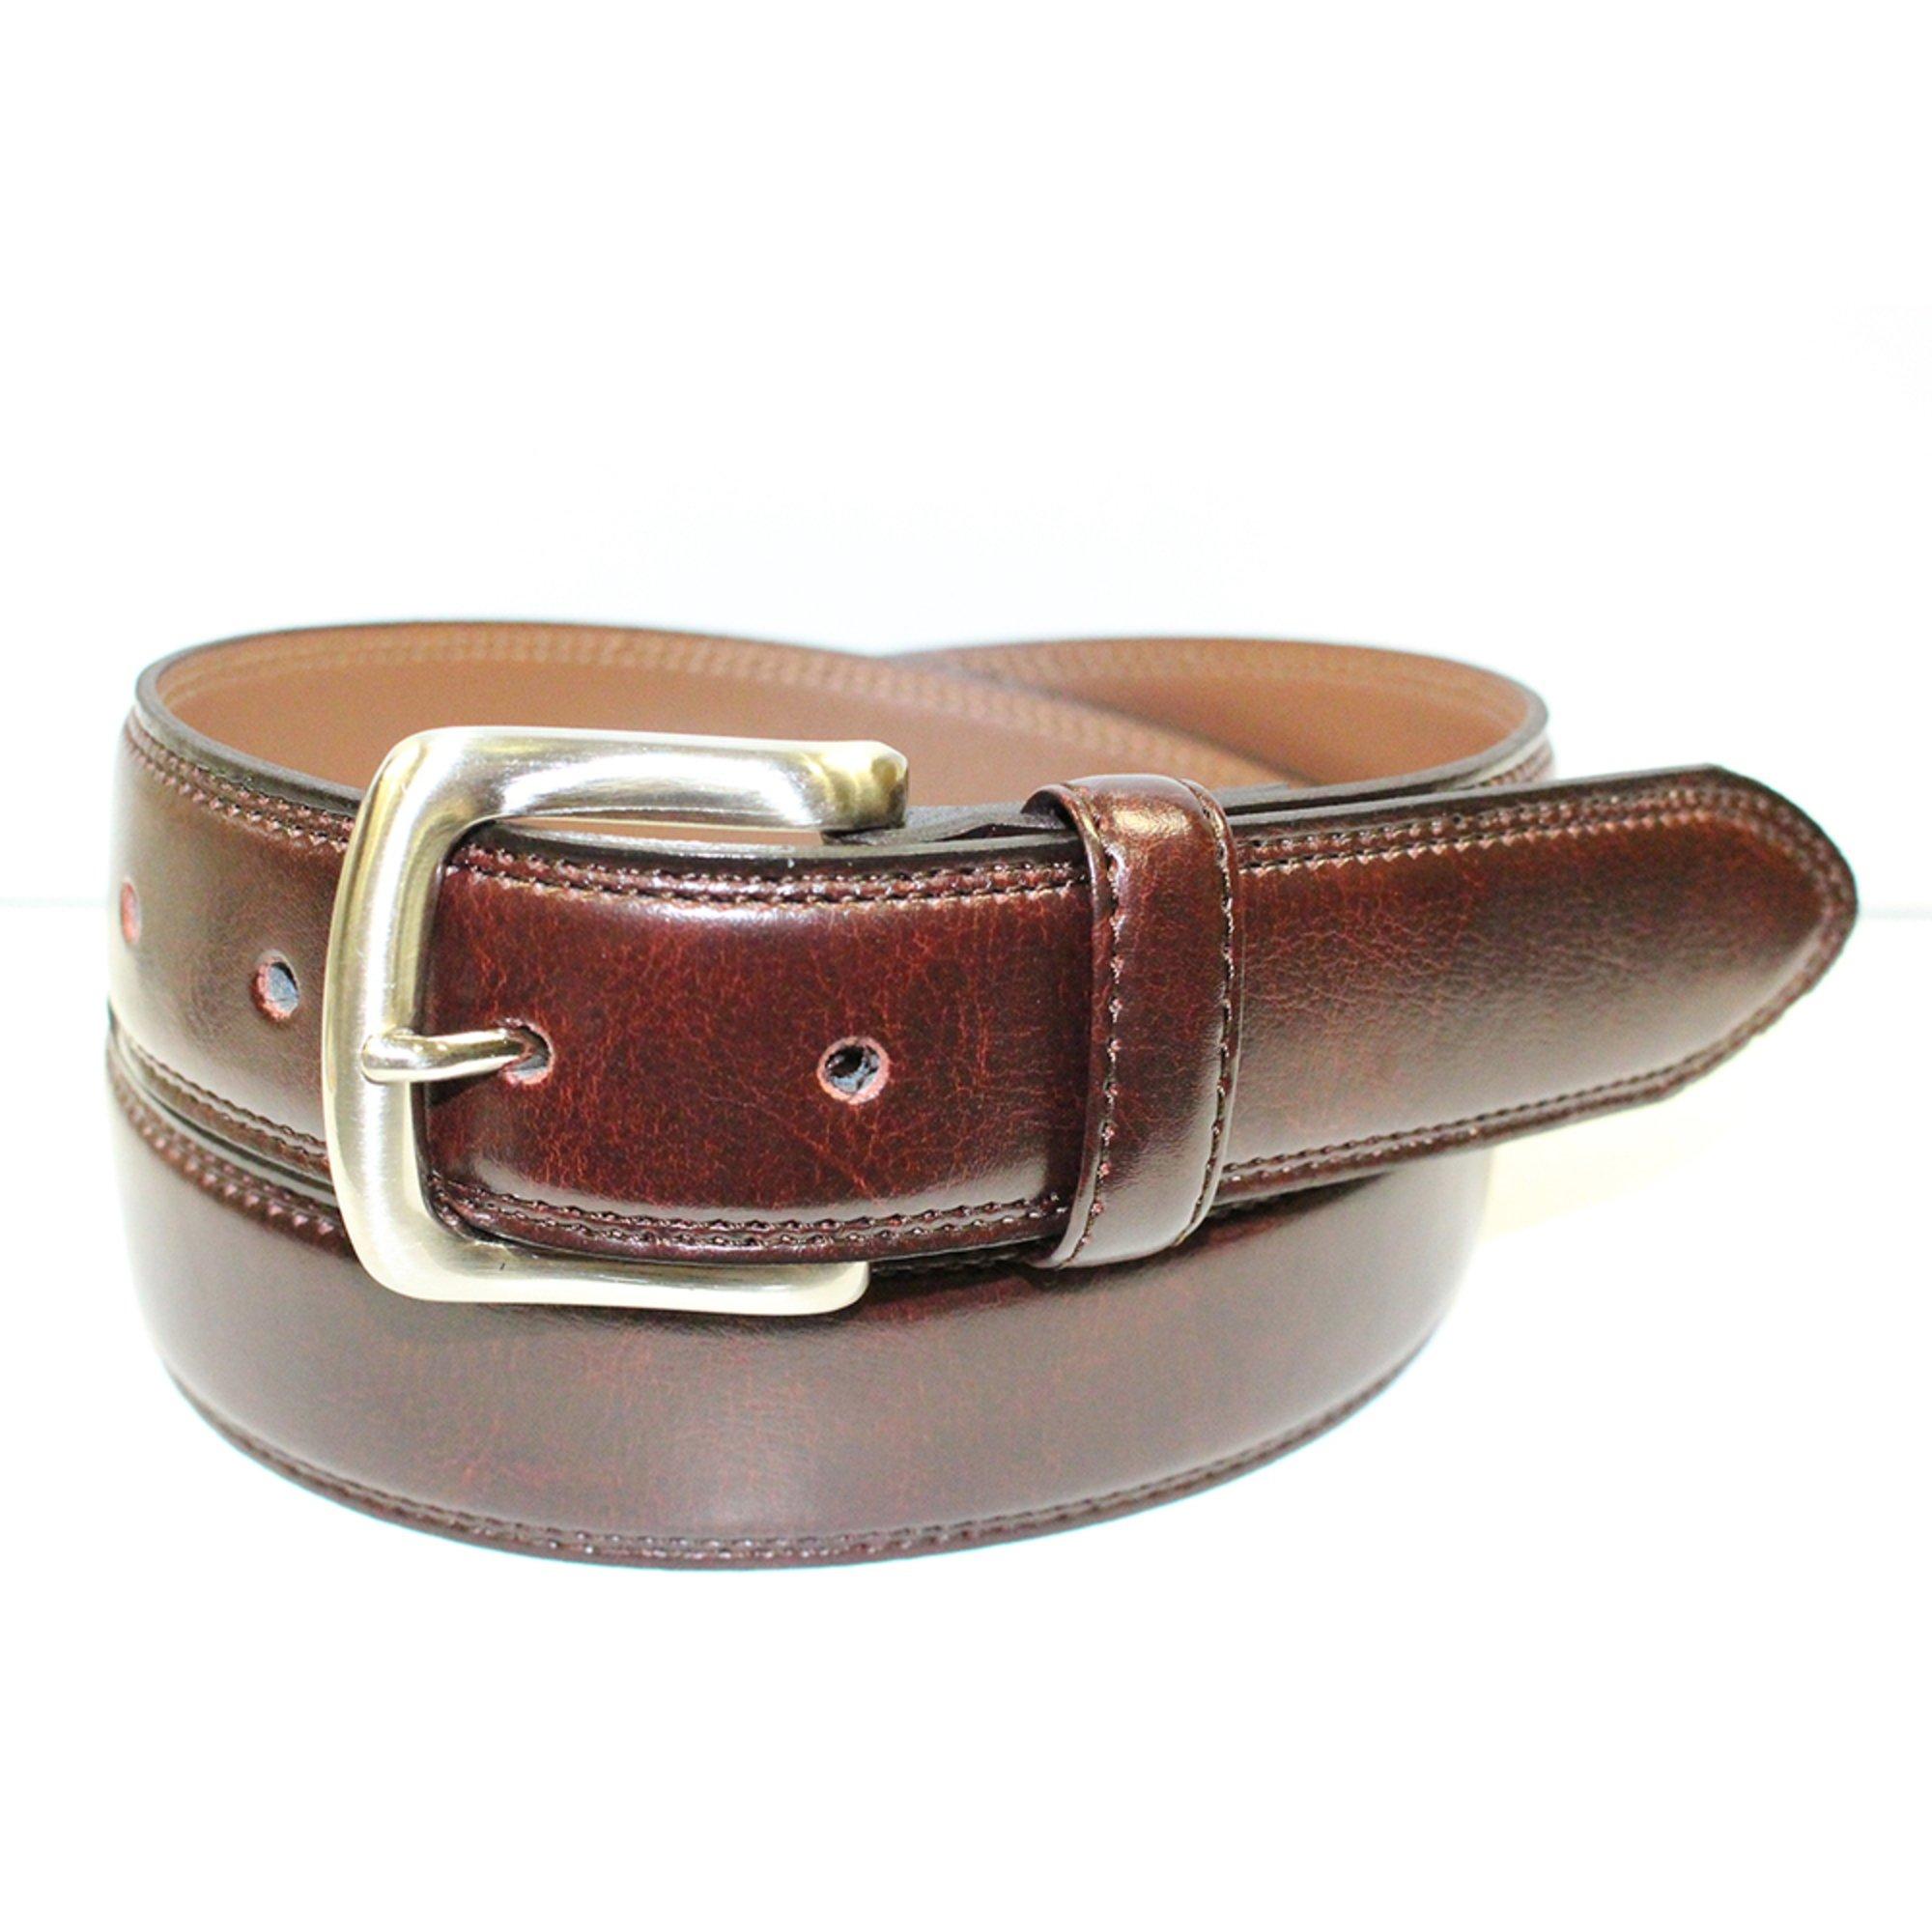 izod dress striped belt burgundy s wallets belts